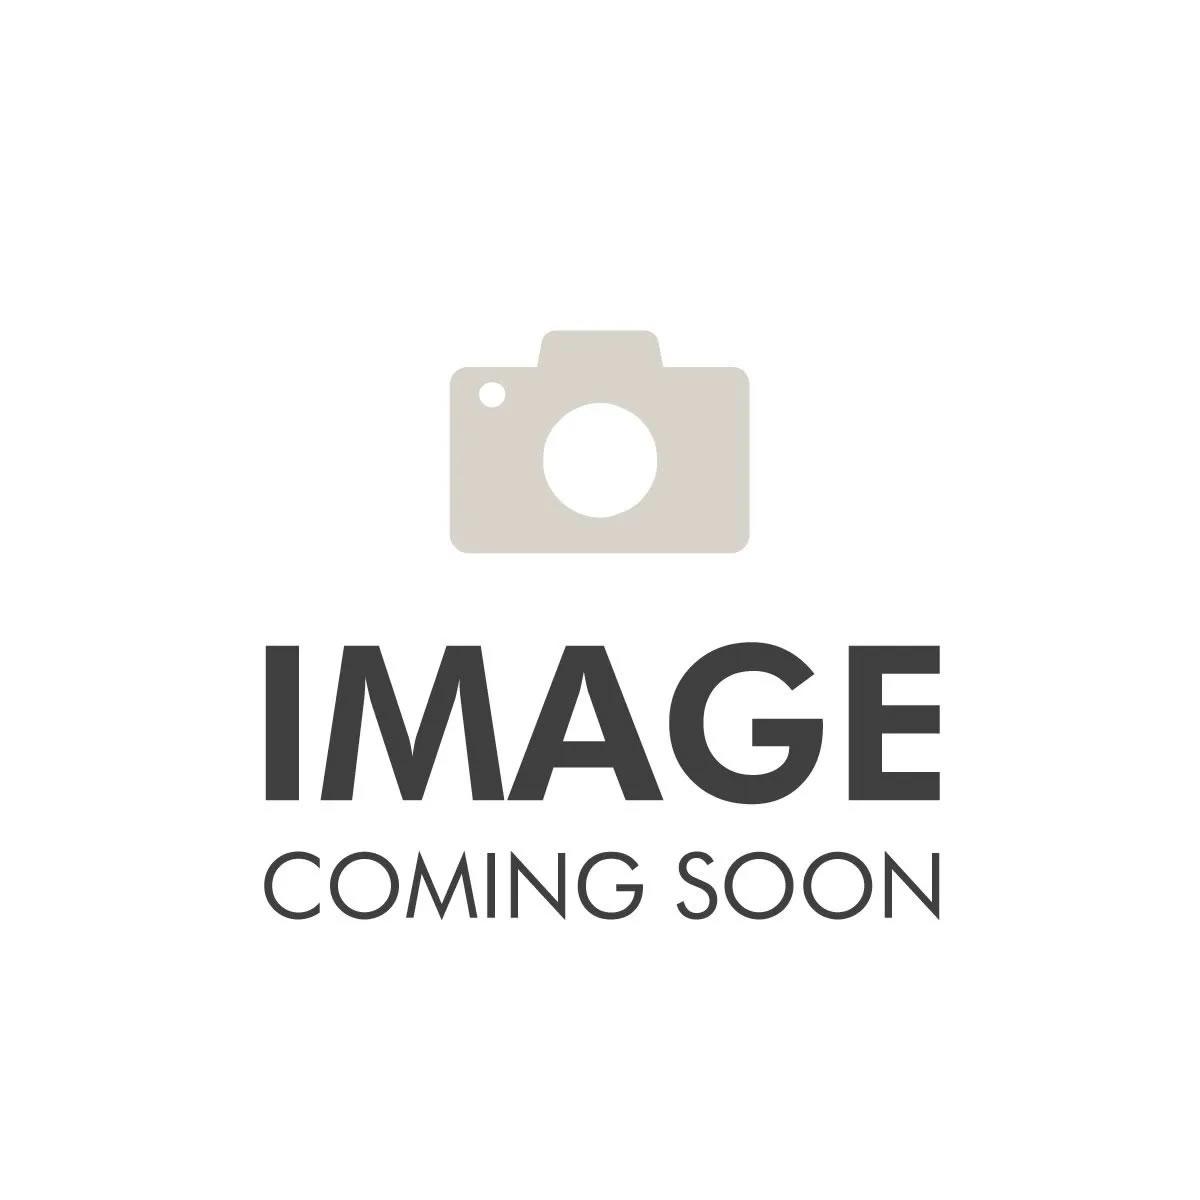 Engine Mounting Kit, 4.0L/4.2L; 87-96 Jeep Wrangler